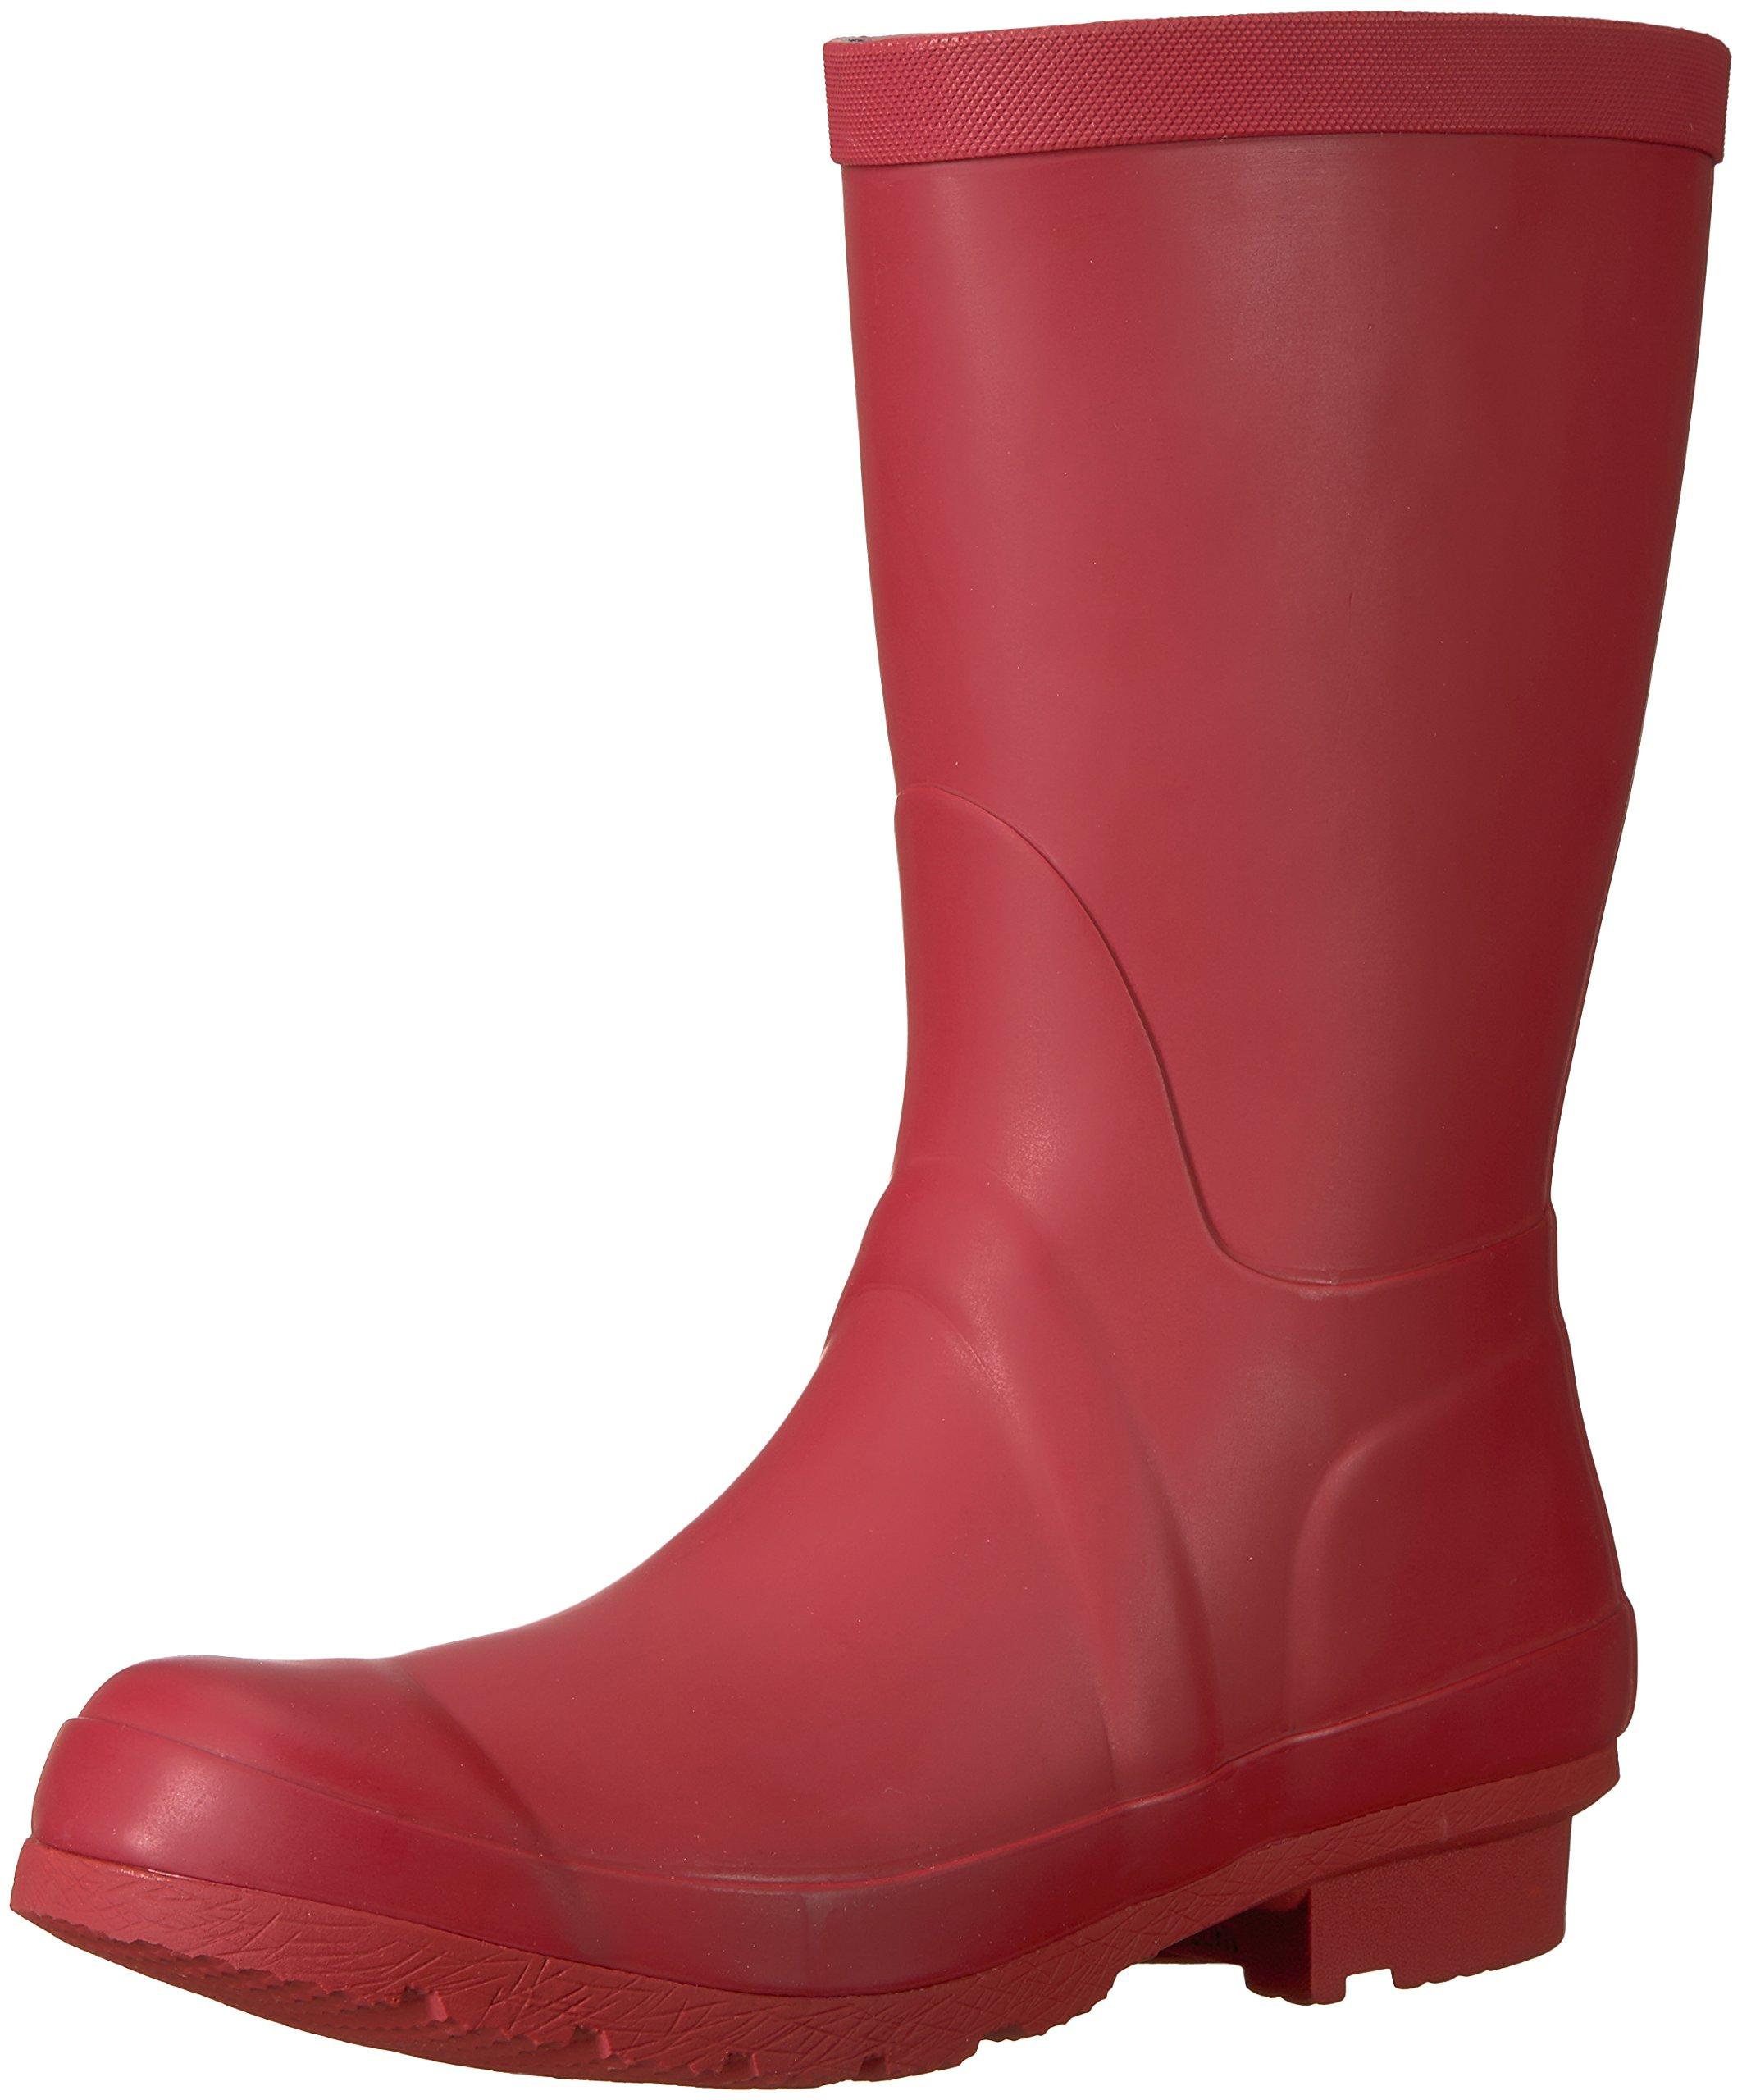 206 Collective Women's Linden Mid Rain Boot, Burgundy, 8 B US